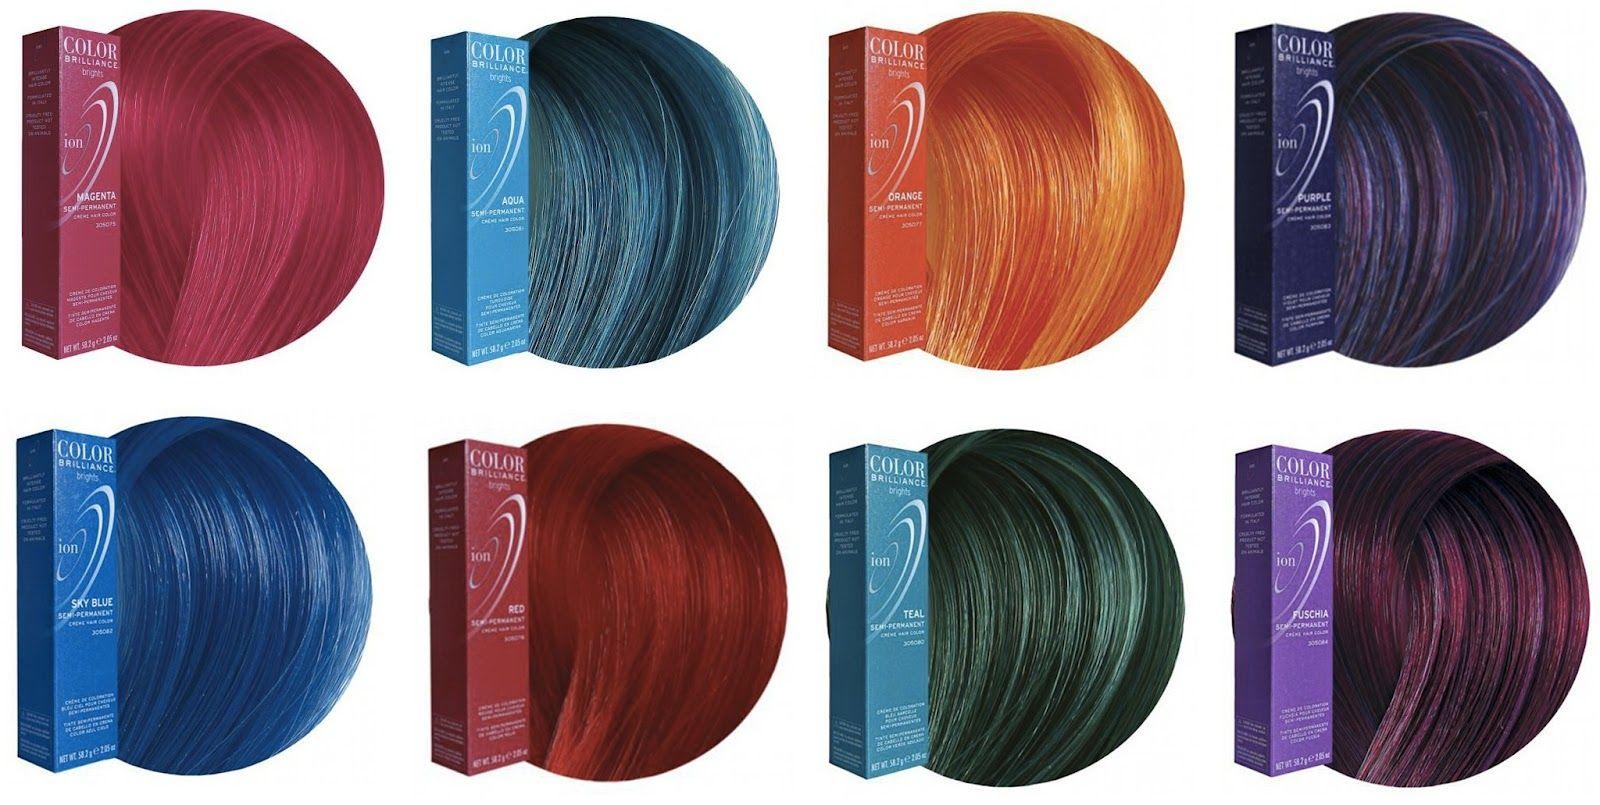 Ion Brilliance Hair Color Chart Erkalnathandedecker